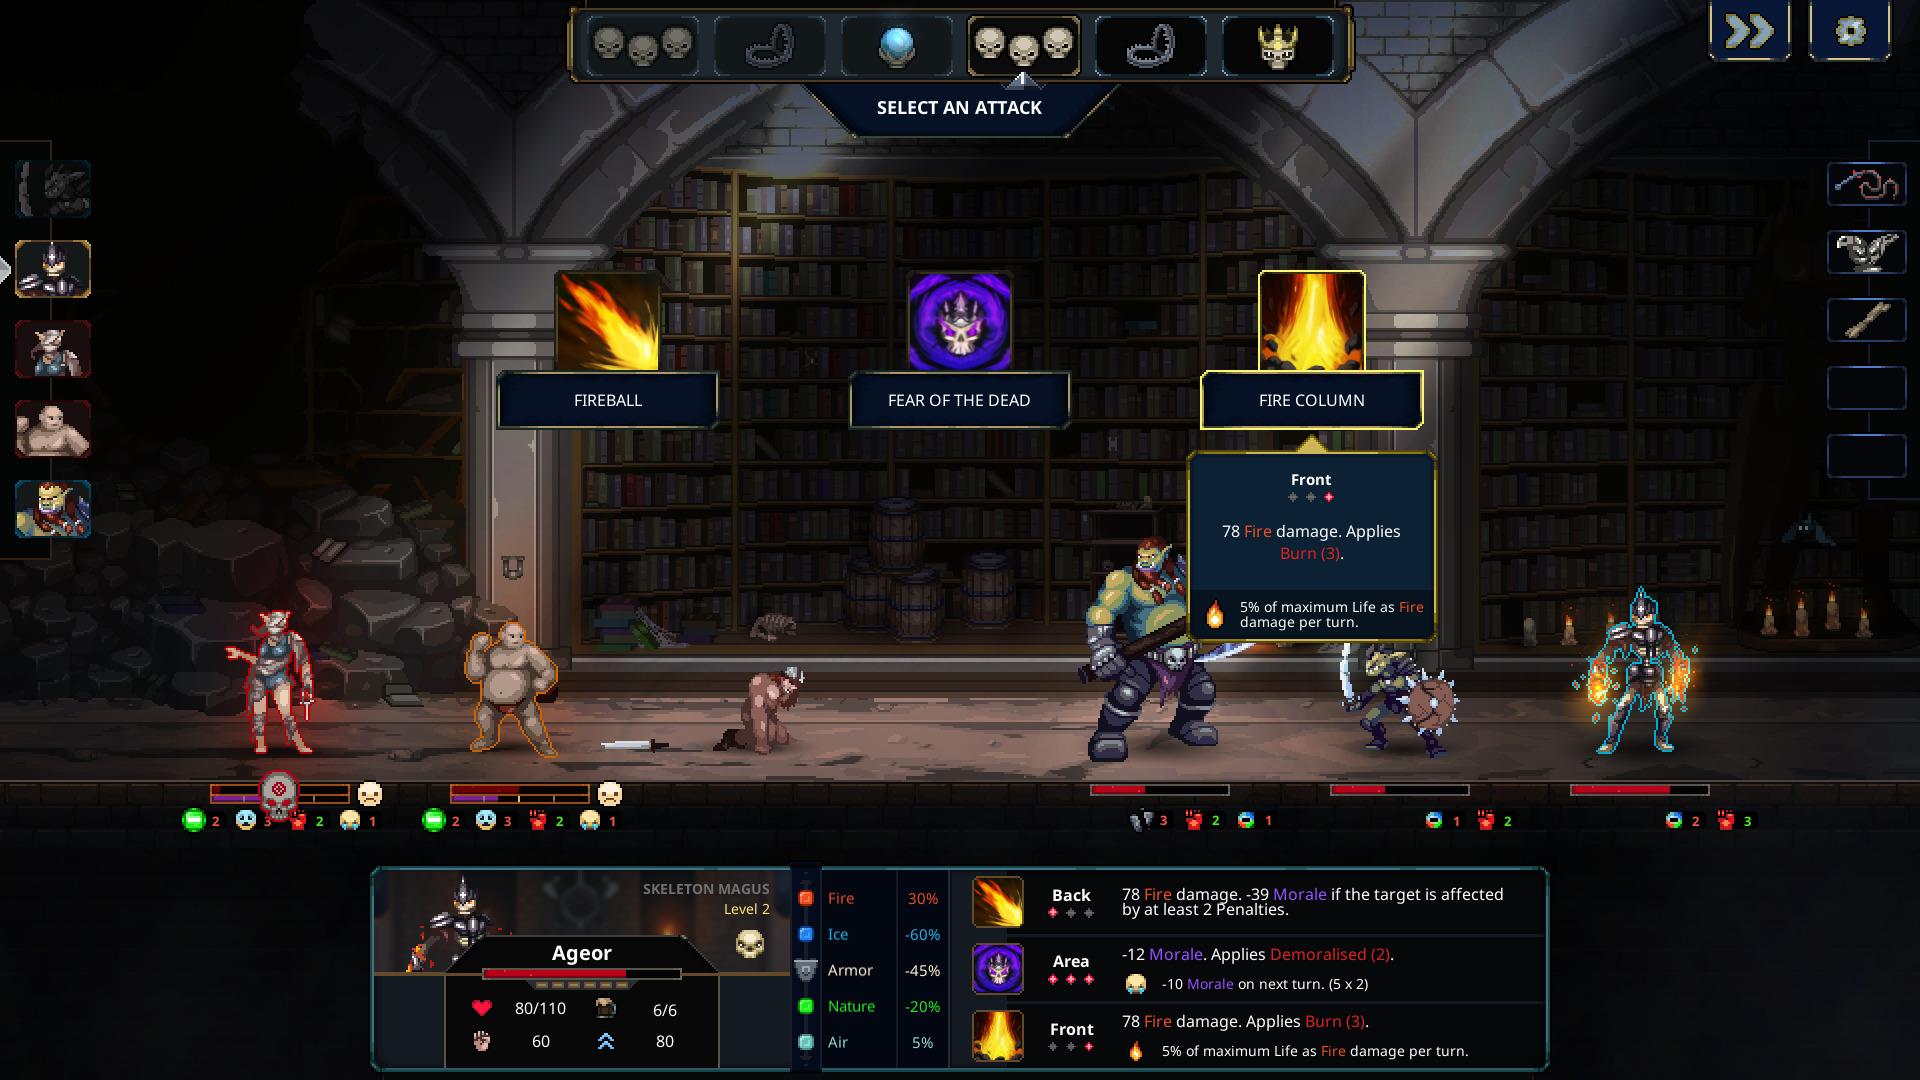 legend-of-keepers-pc-screenshot-4